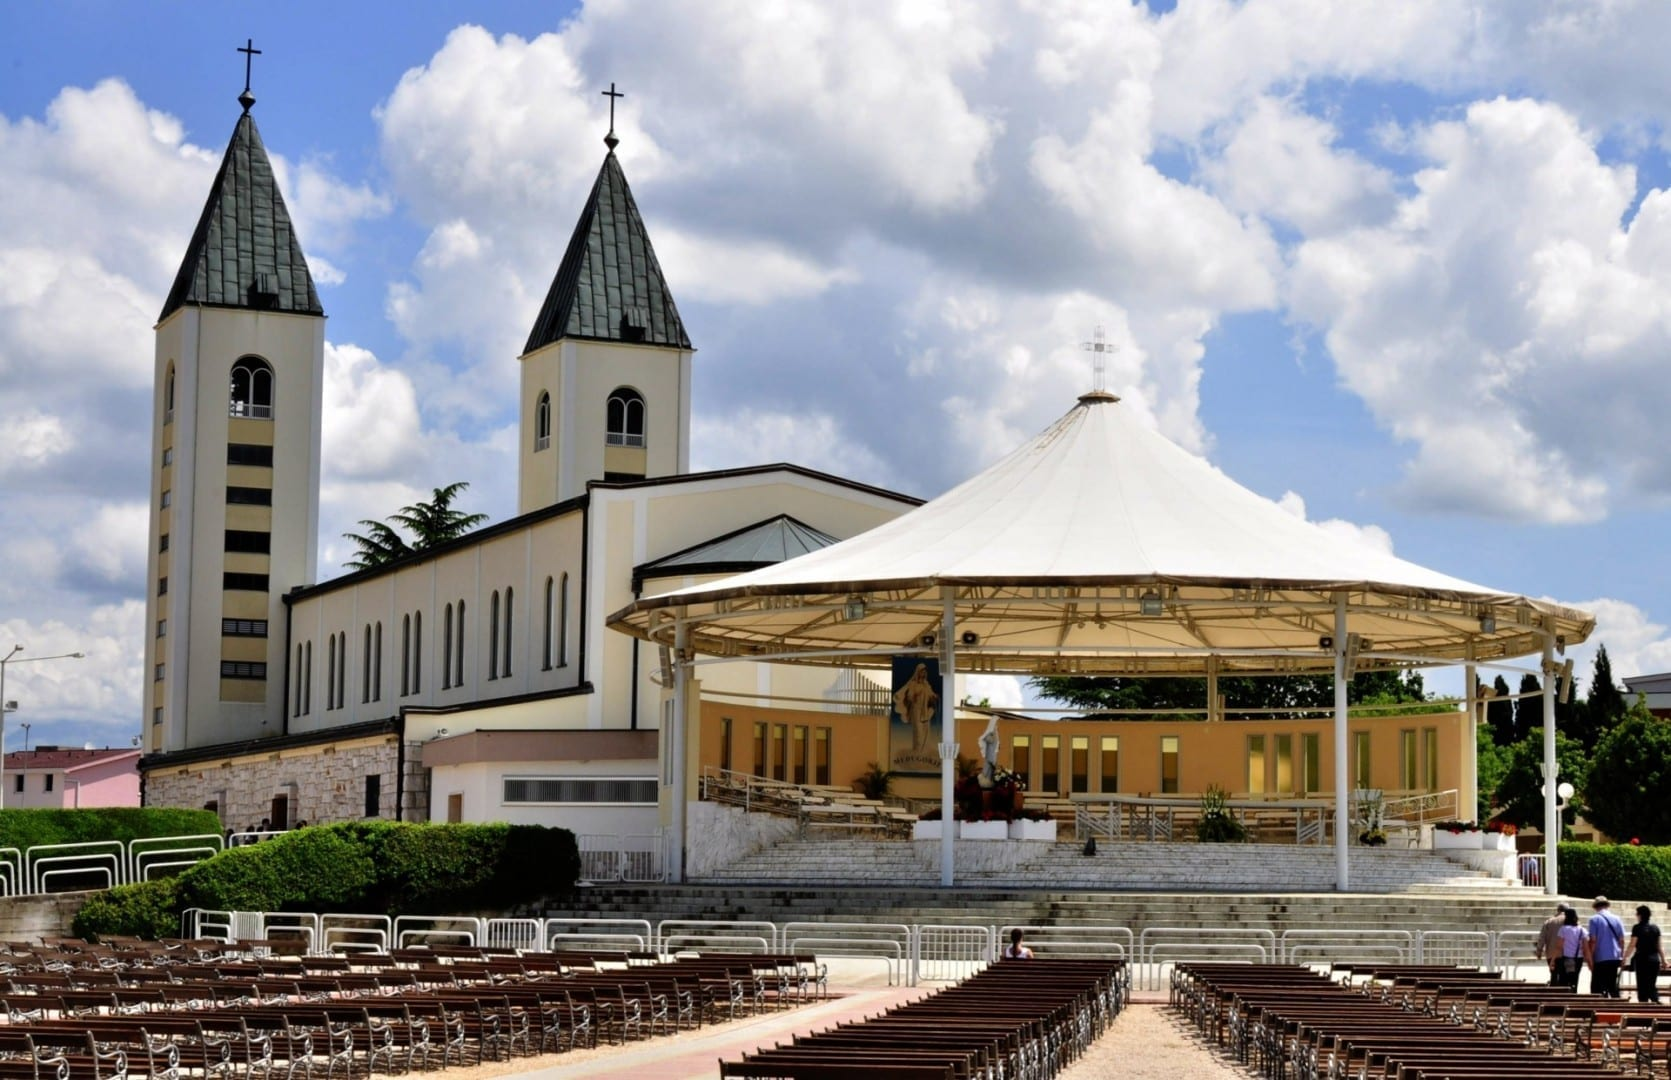 El altar exterior de la Iglesia de Santiago. Medjugorje Bosnia y Herzegovina